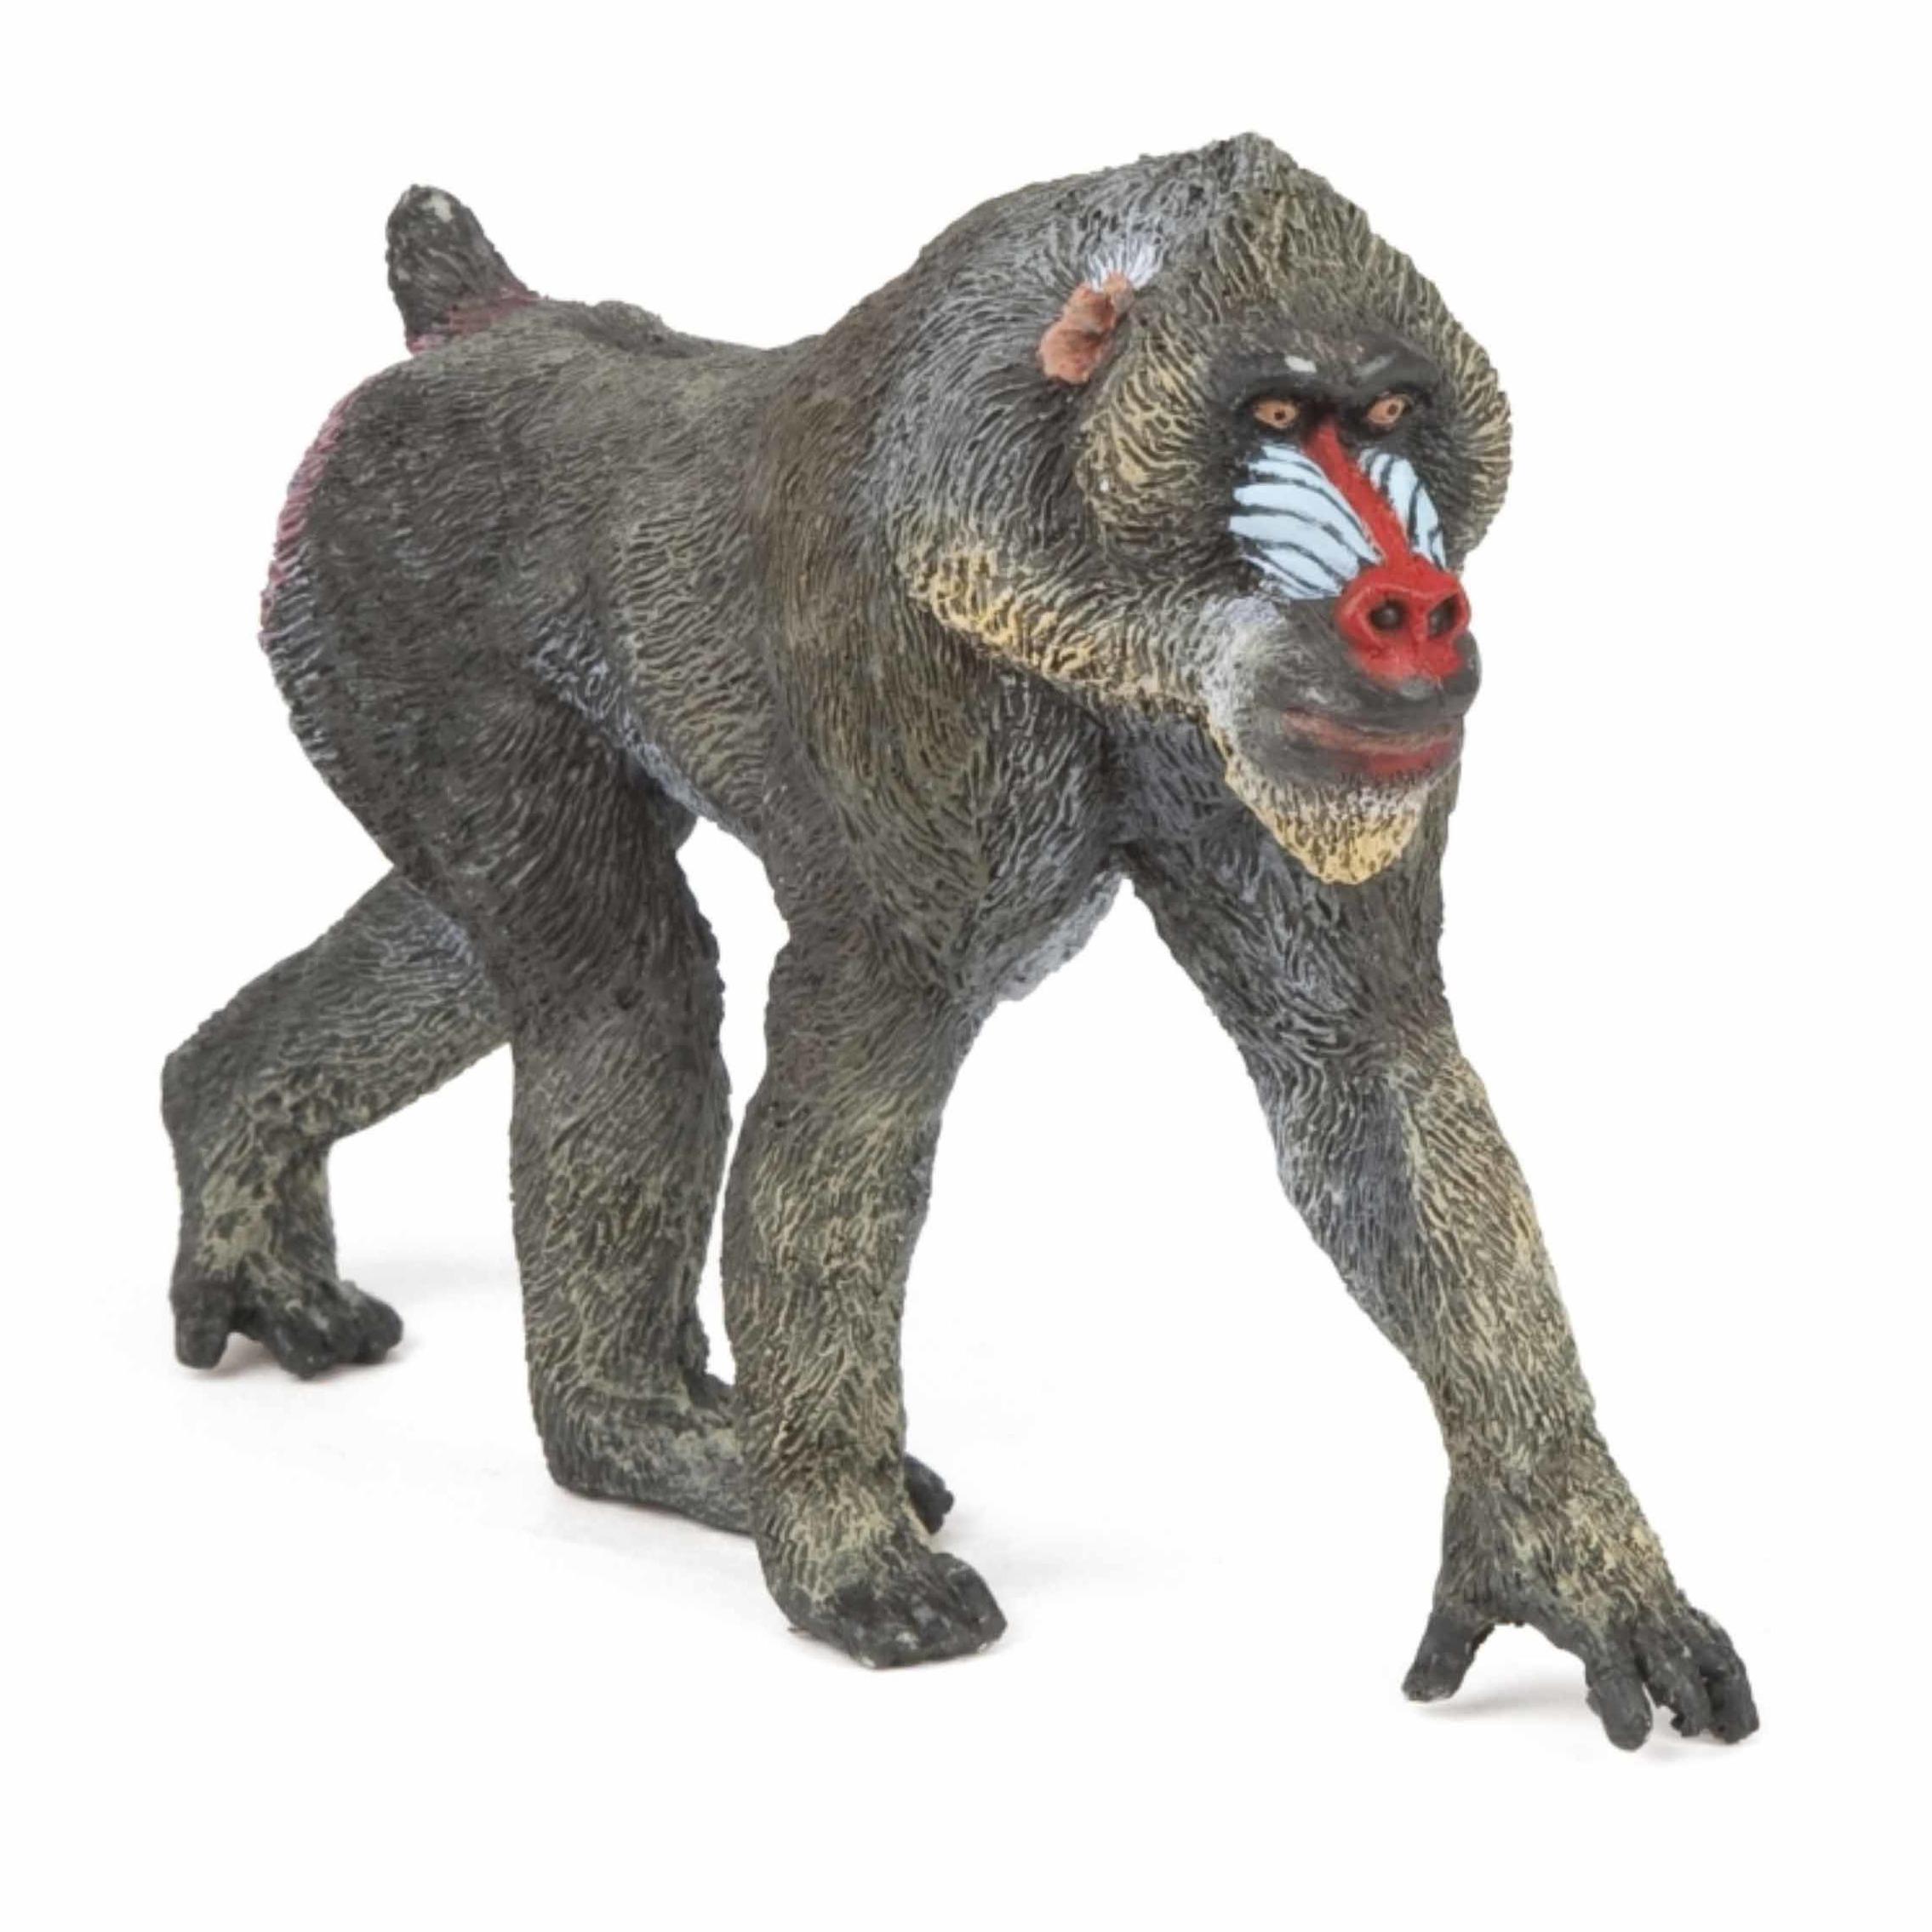 Plastic Mandrill baviaan speeldiertje 10 cm